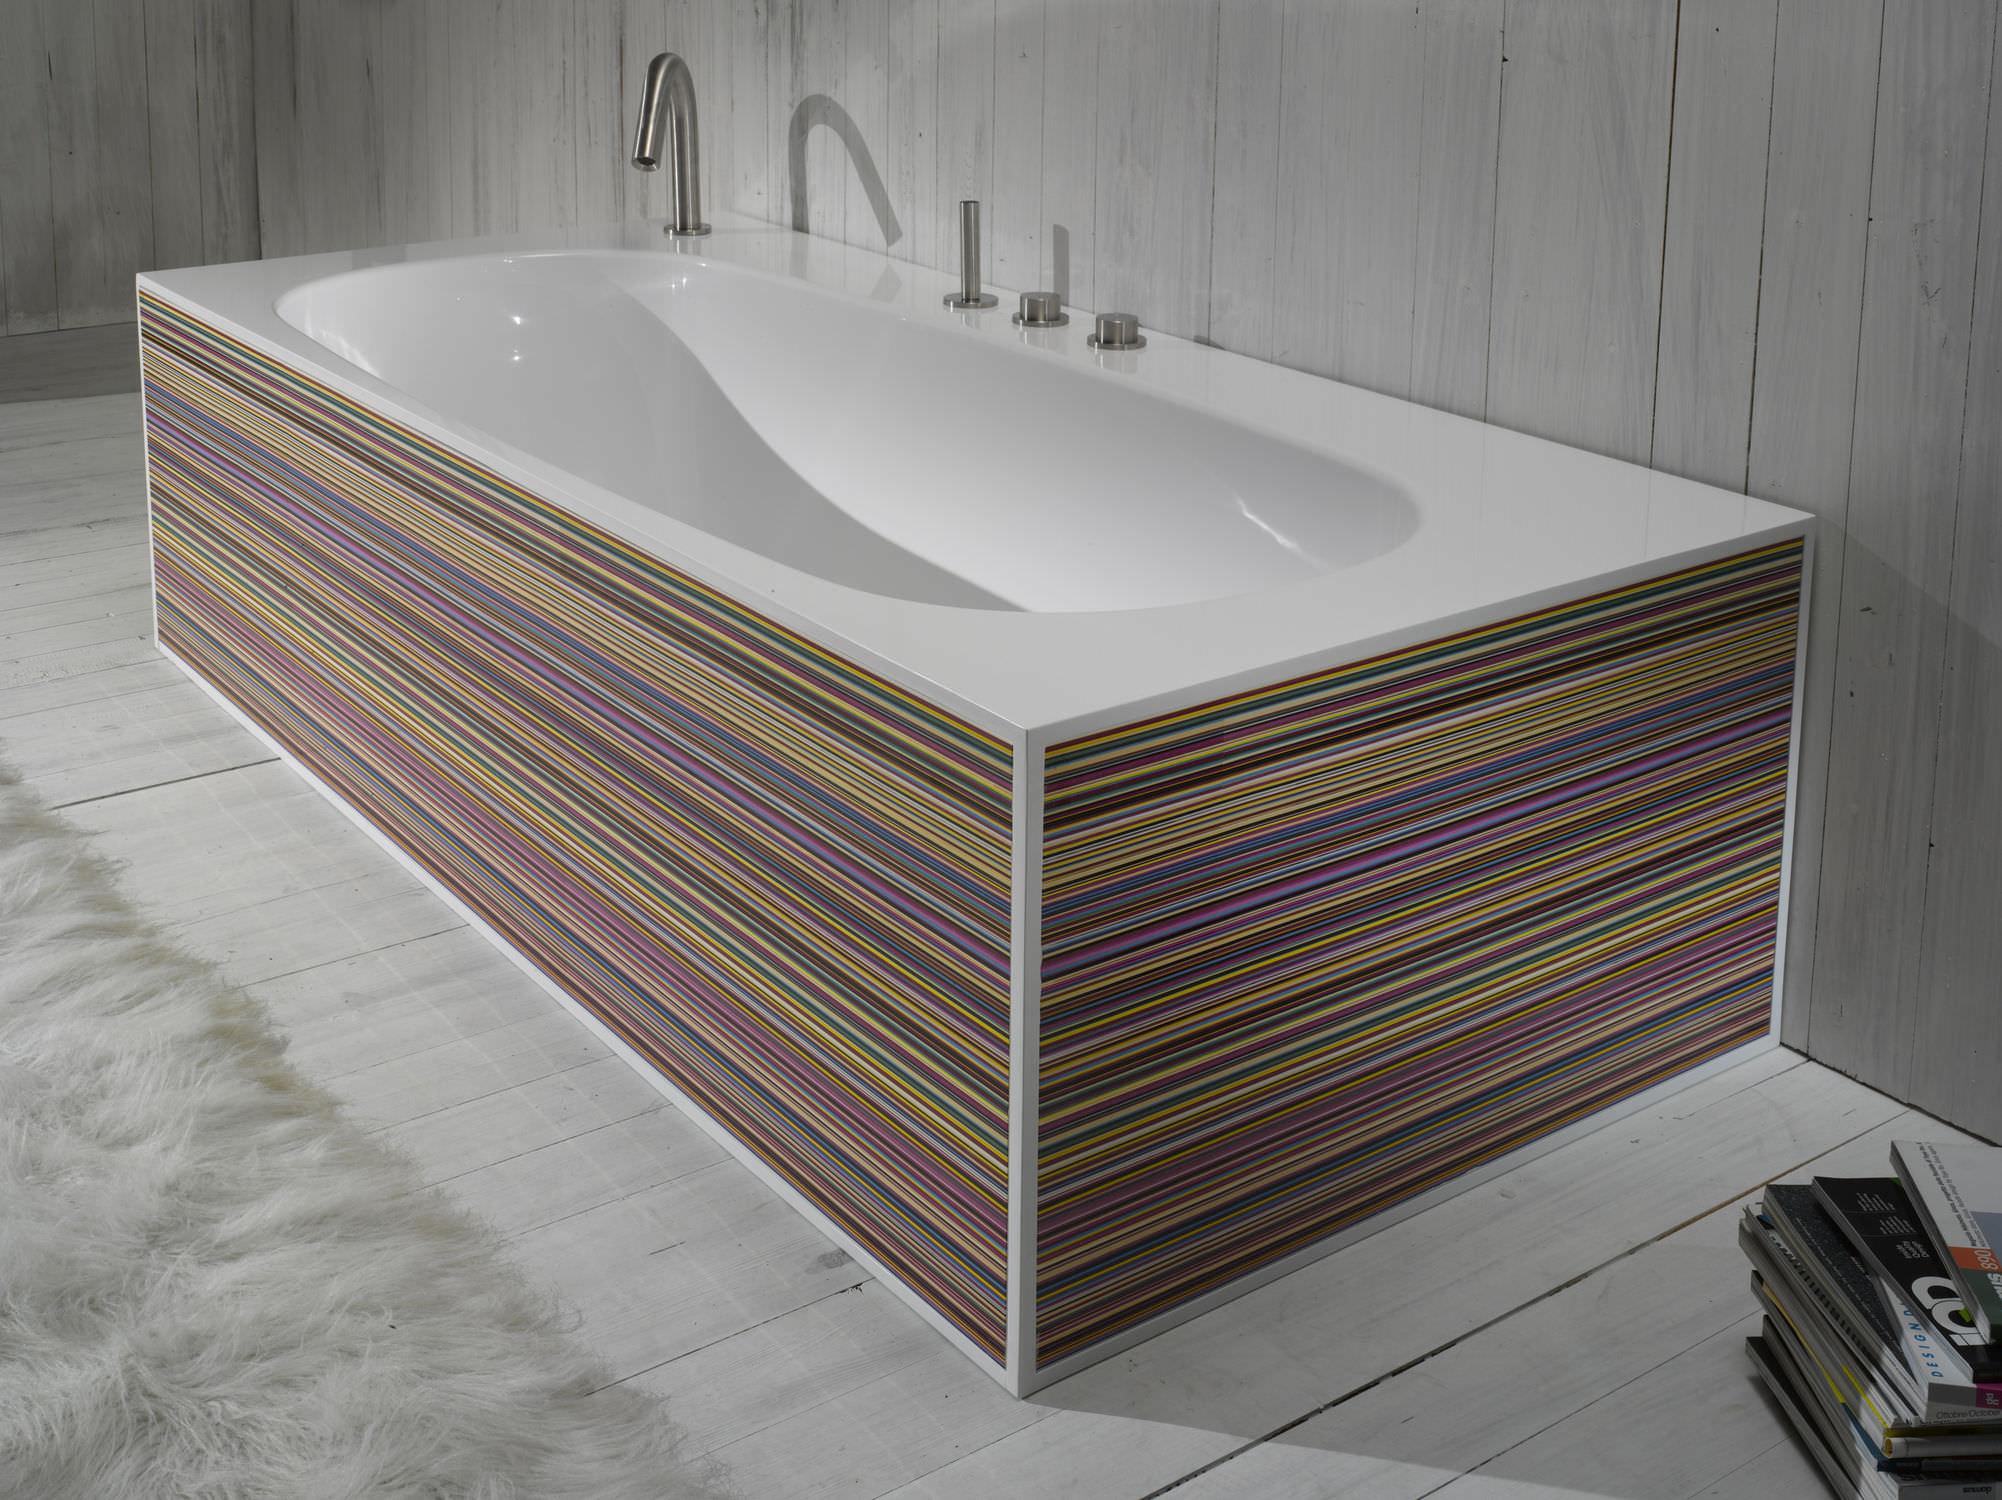 Vasca Da Bagno Resina : Vasca da bagno ad isola in resina acrilica cover a e t italia